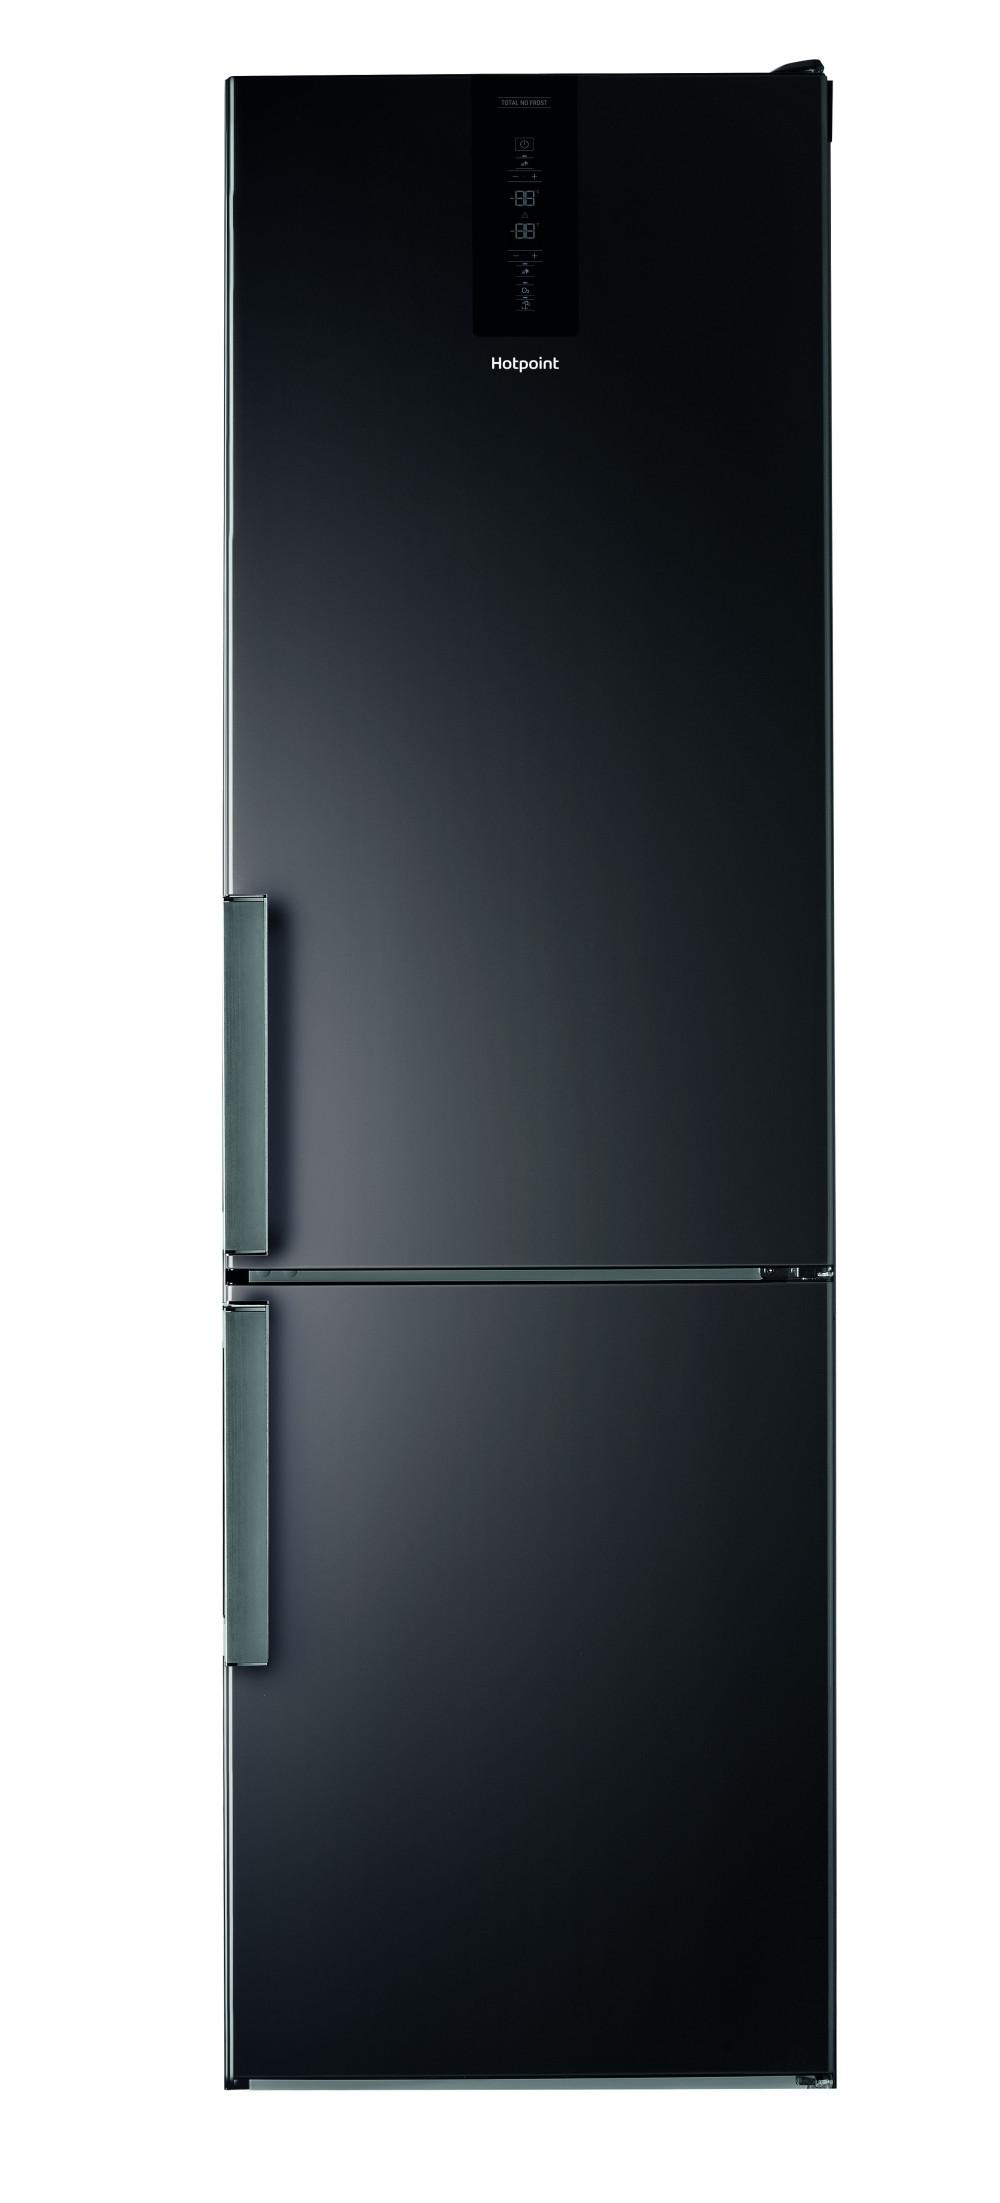 Hotpoint H9T 921T KS H Fridge Freezer featured image